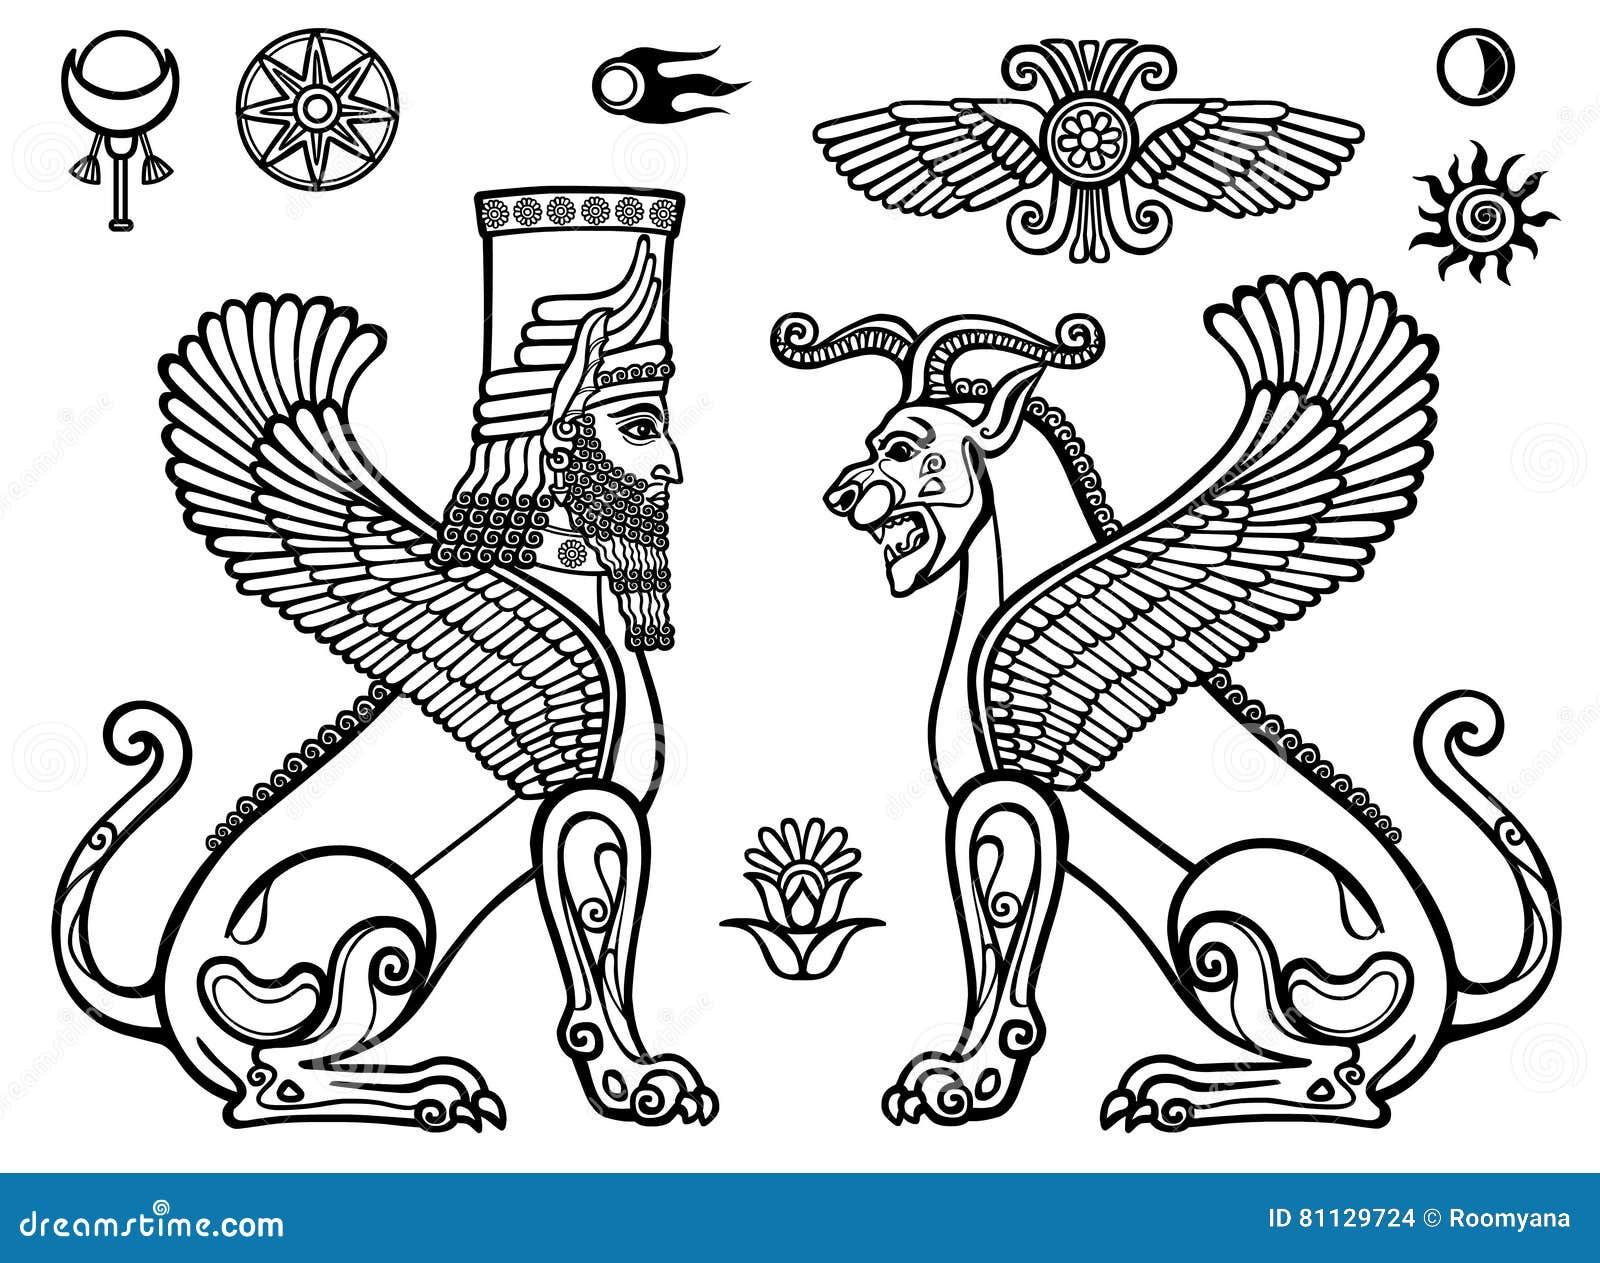 Mythology stock illustrations 36969 mythology stock illustrations graphic set figures of the assyrian mythology a lion and a sphinx of people buycottarizona Image collections